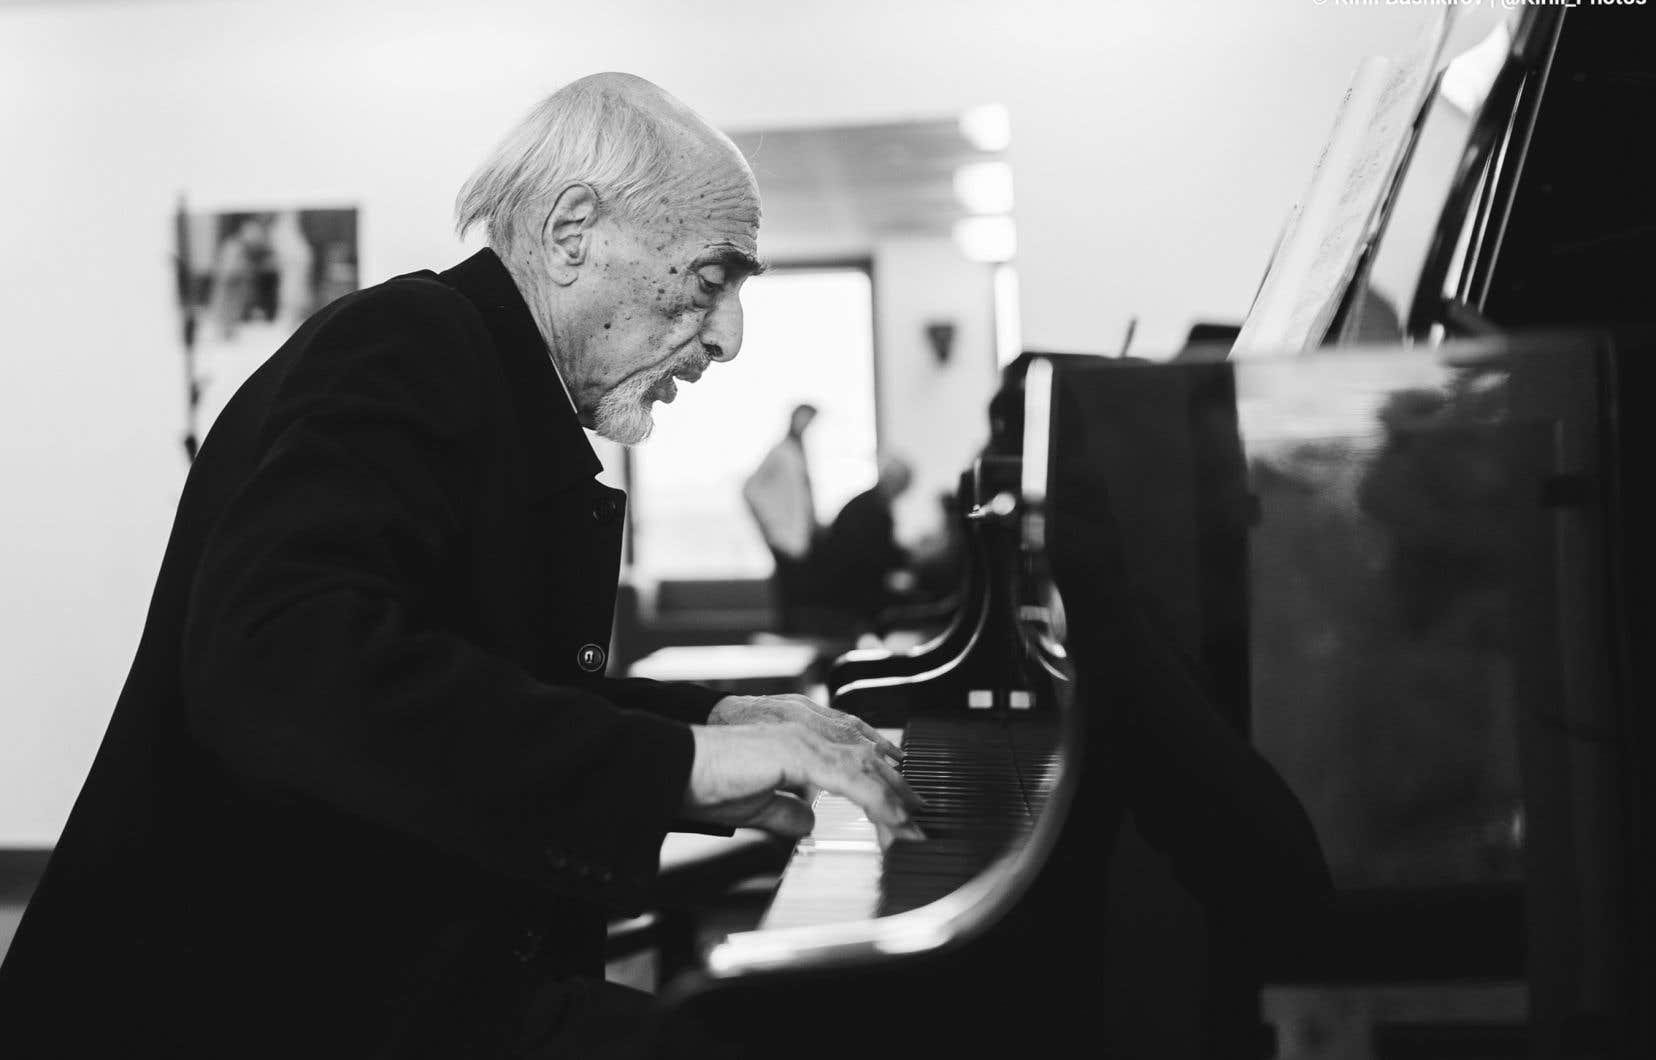 Le pianiste russe Dmitri Bashkirov